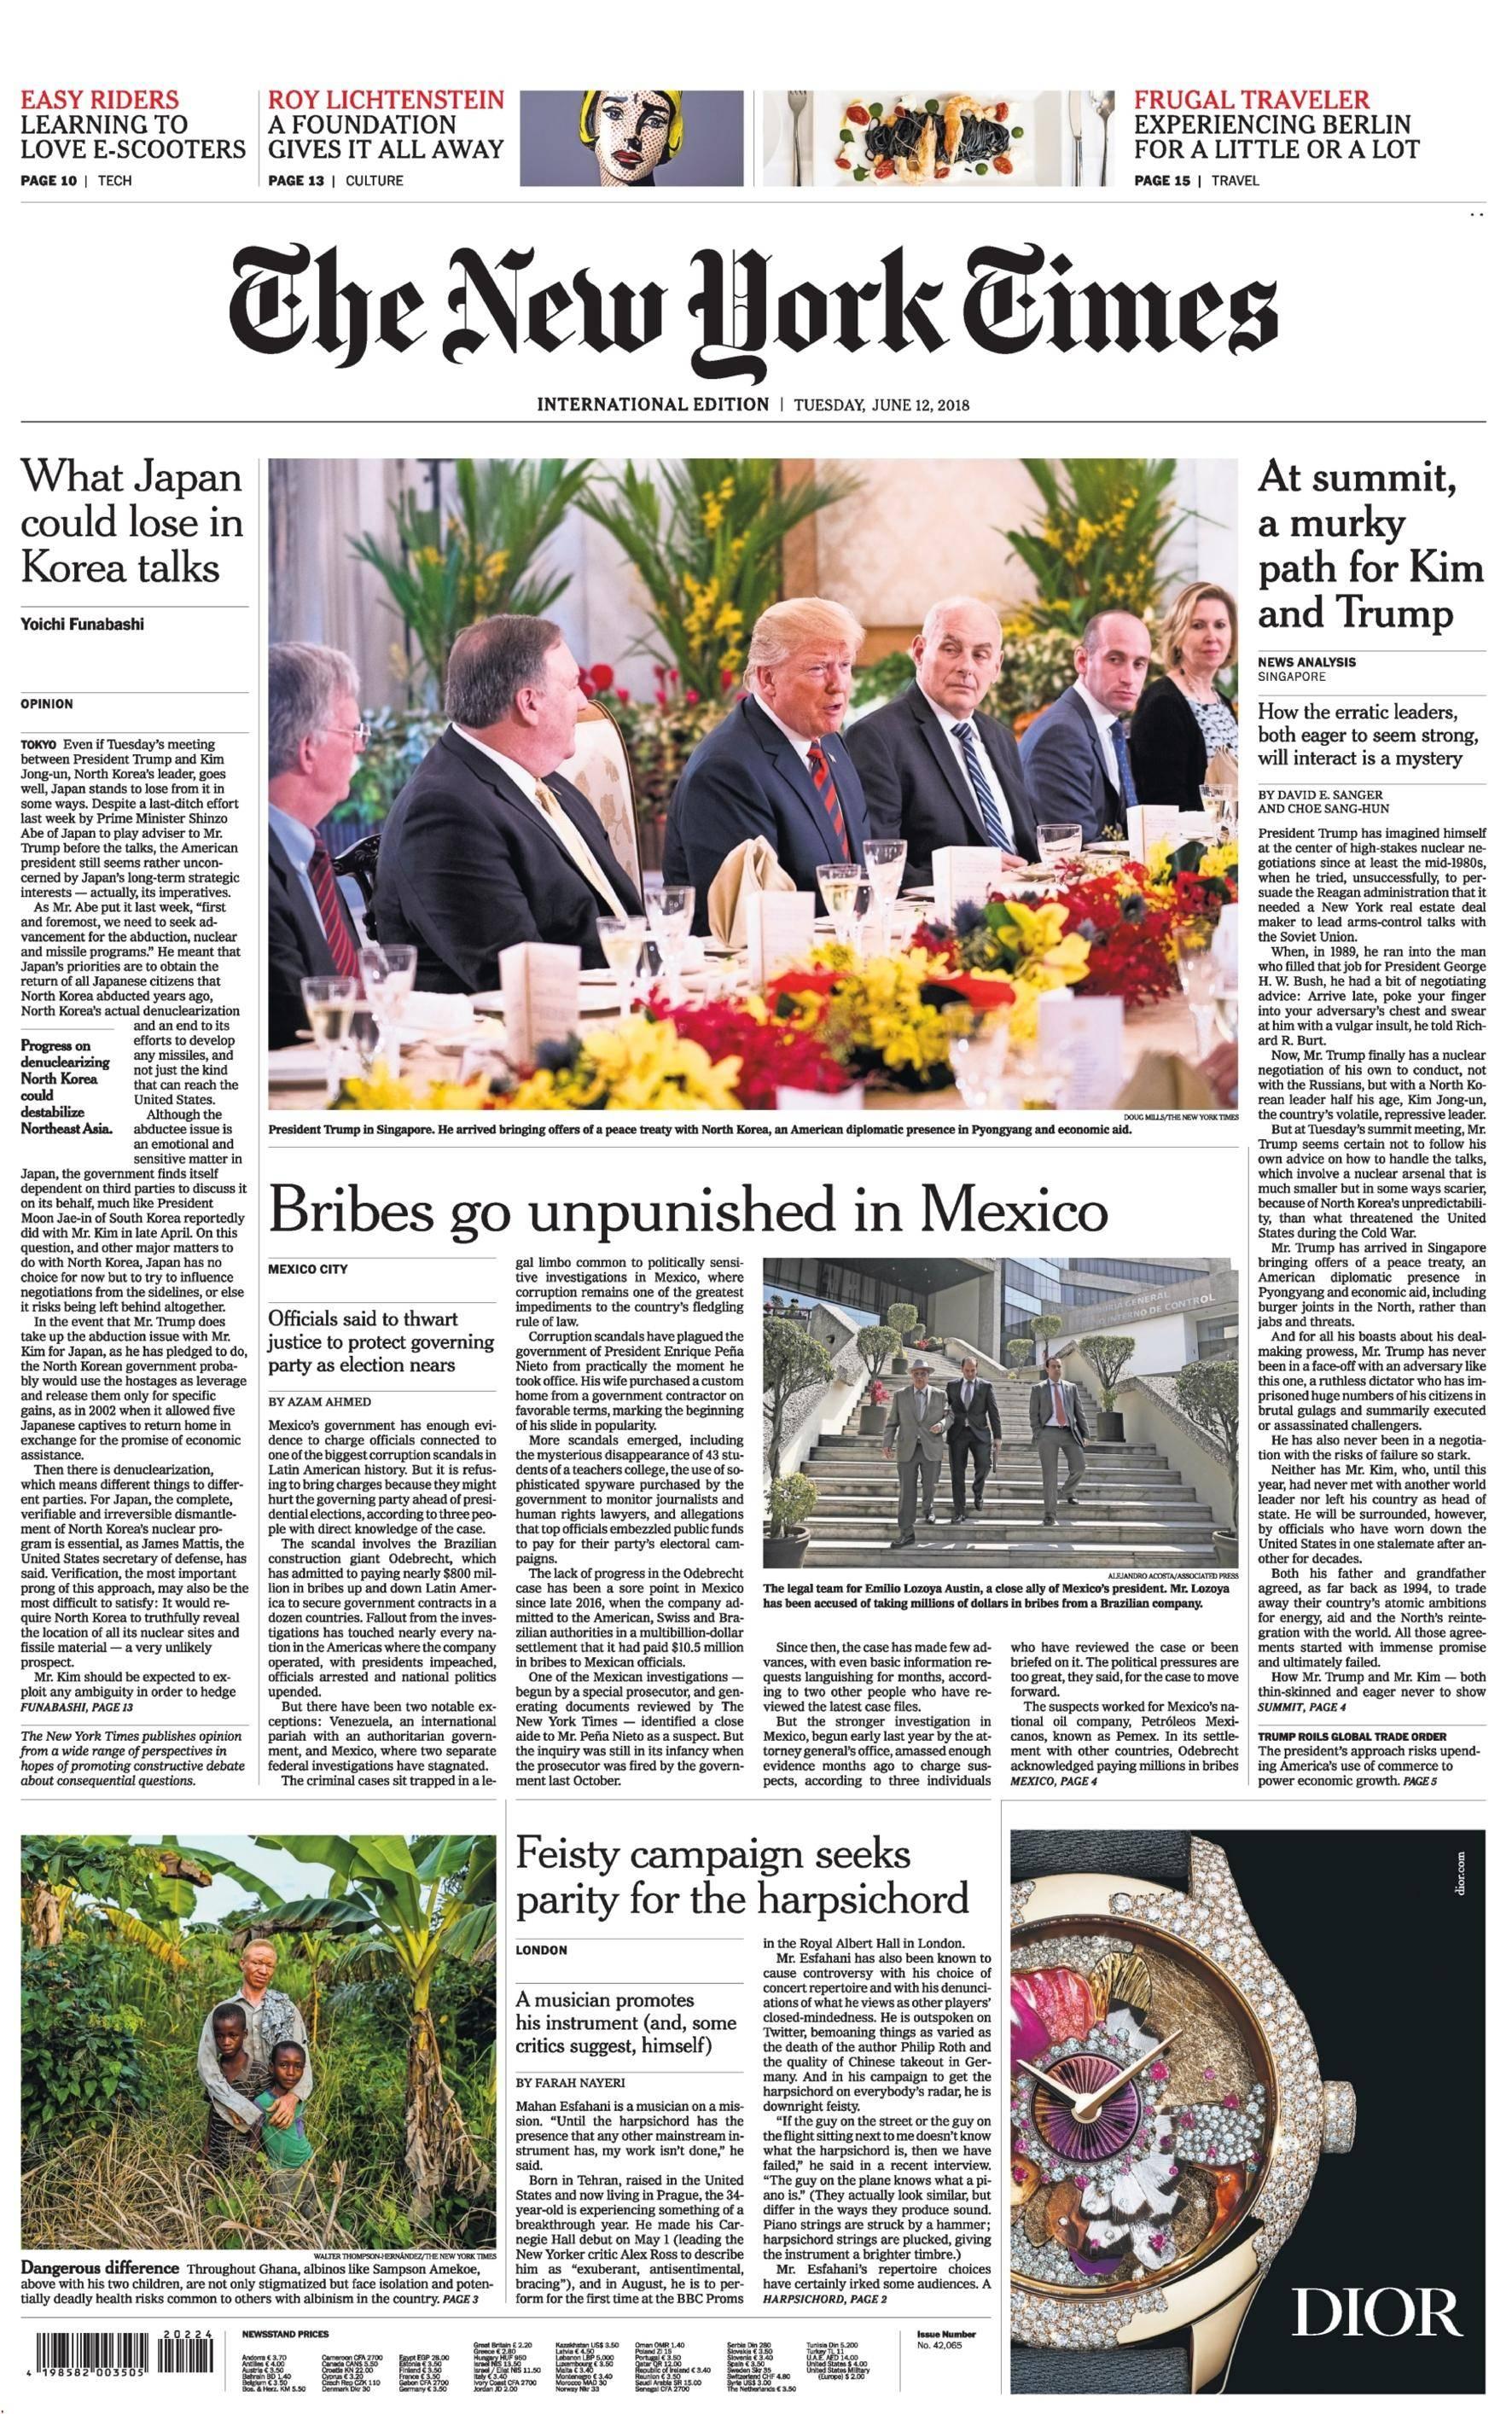 International New York Times - 12 June 2018